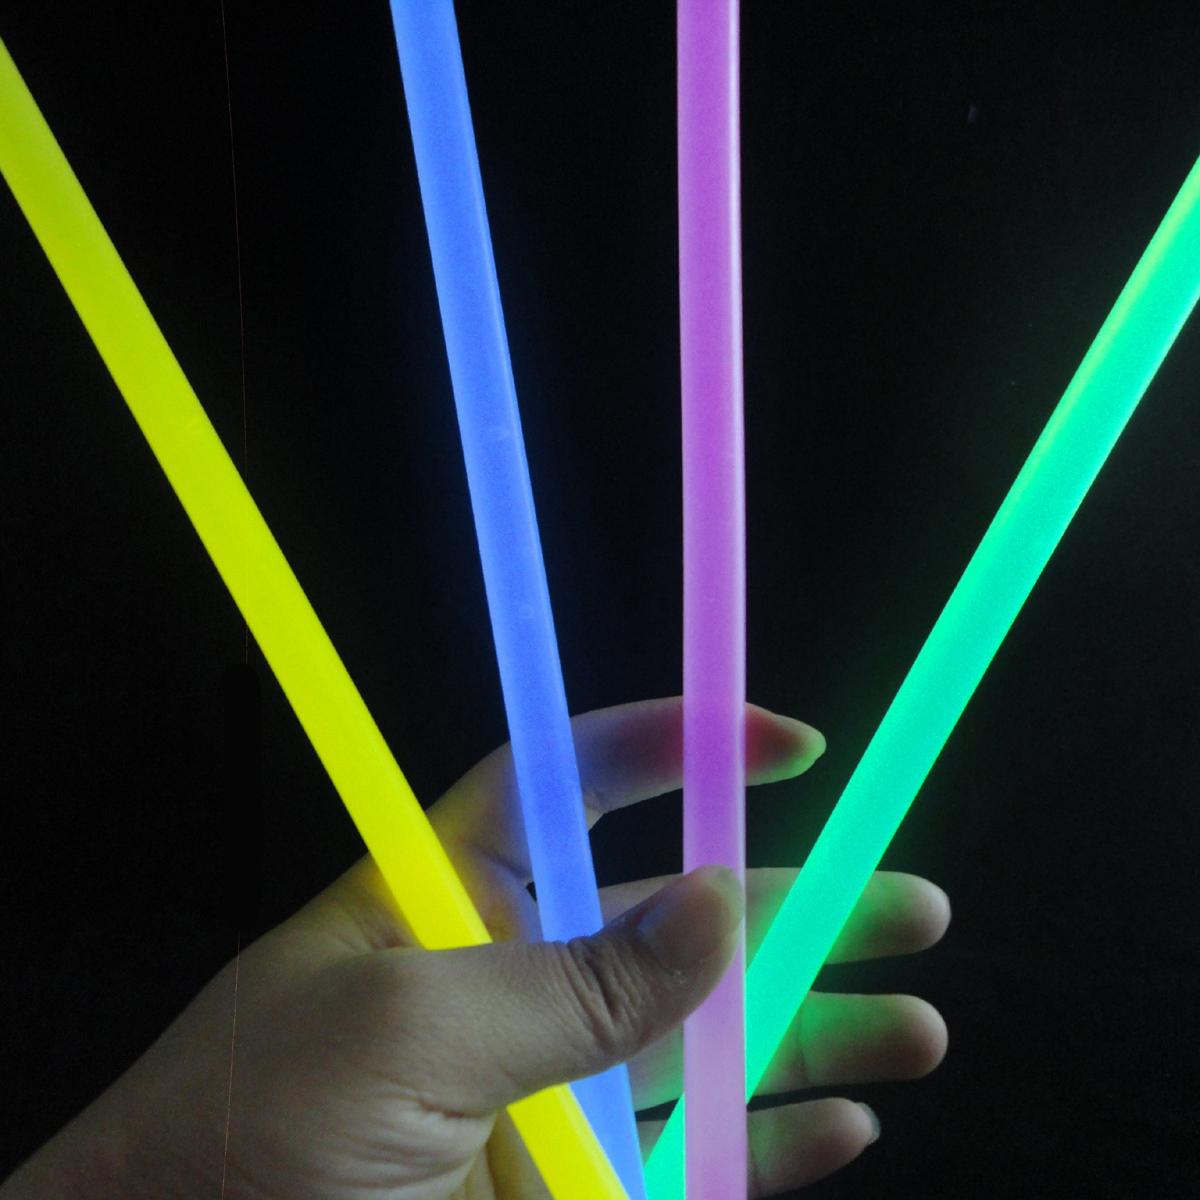 Glow Neon Neon Stick Neon Caps Glow